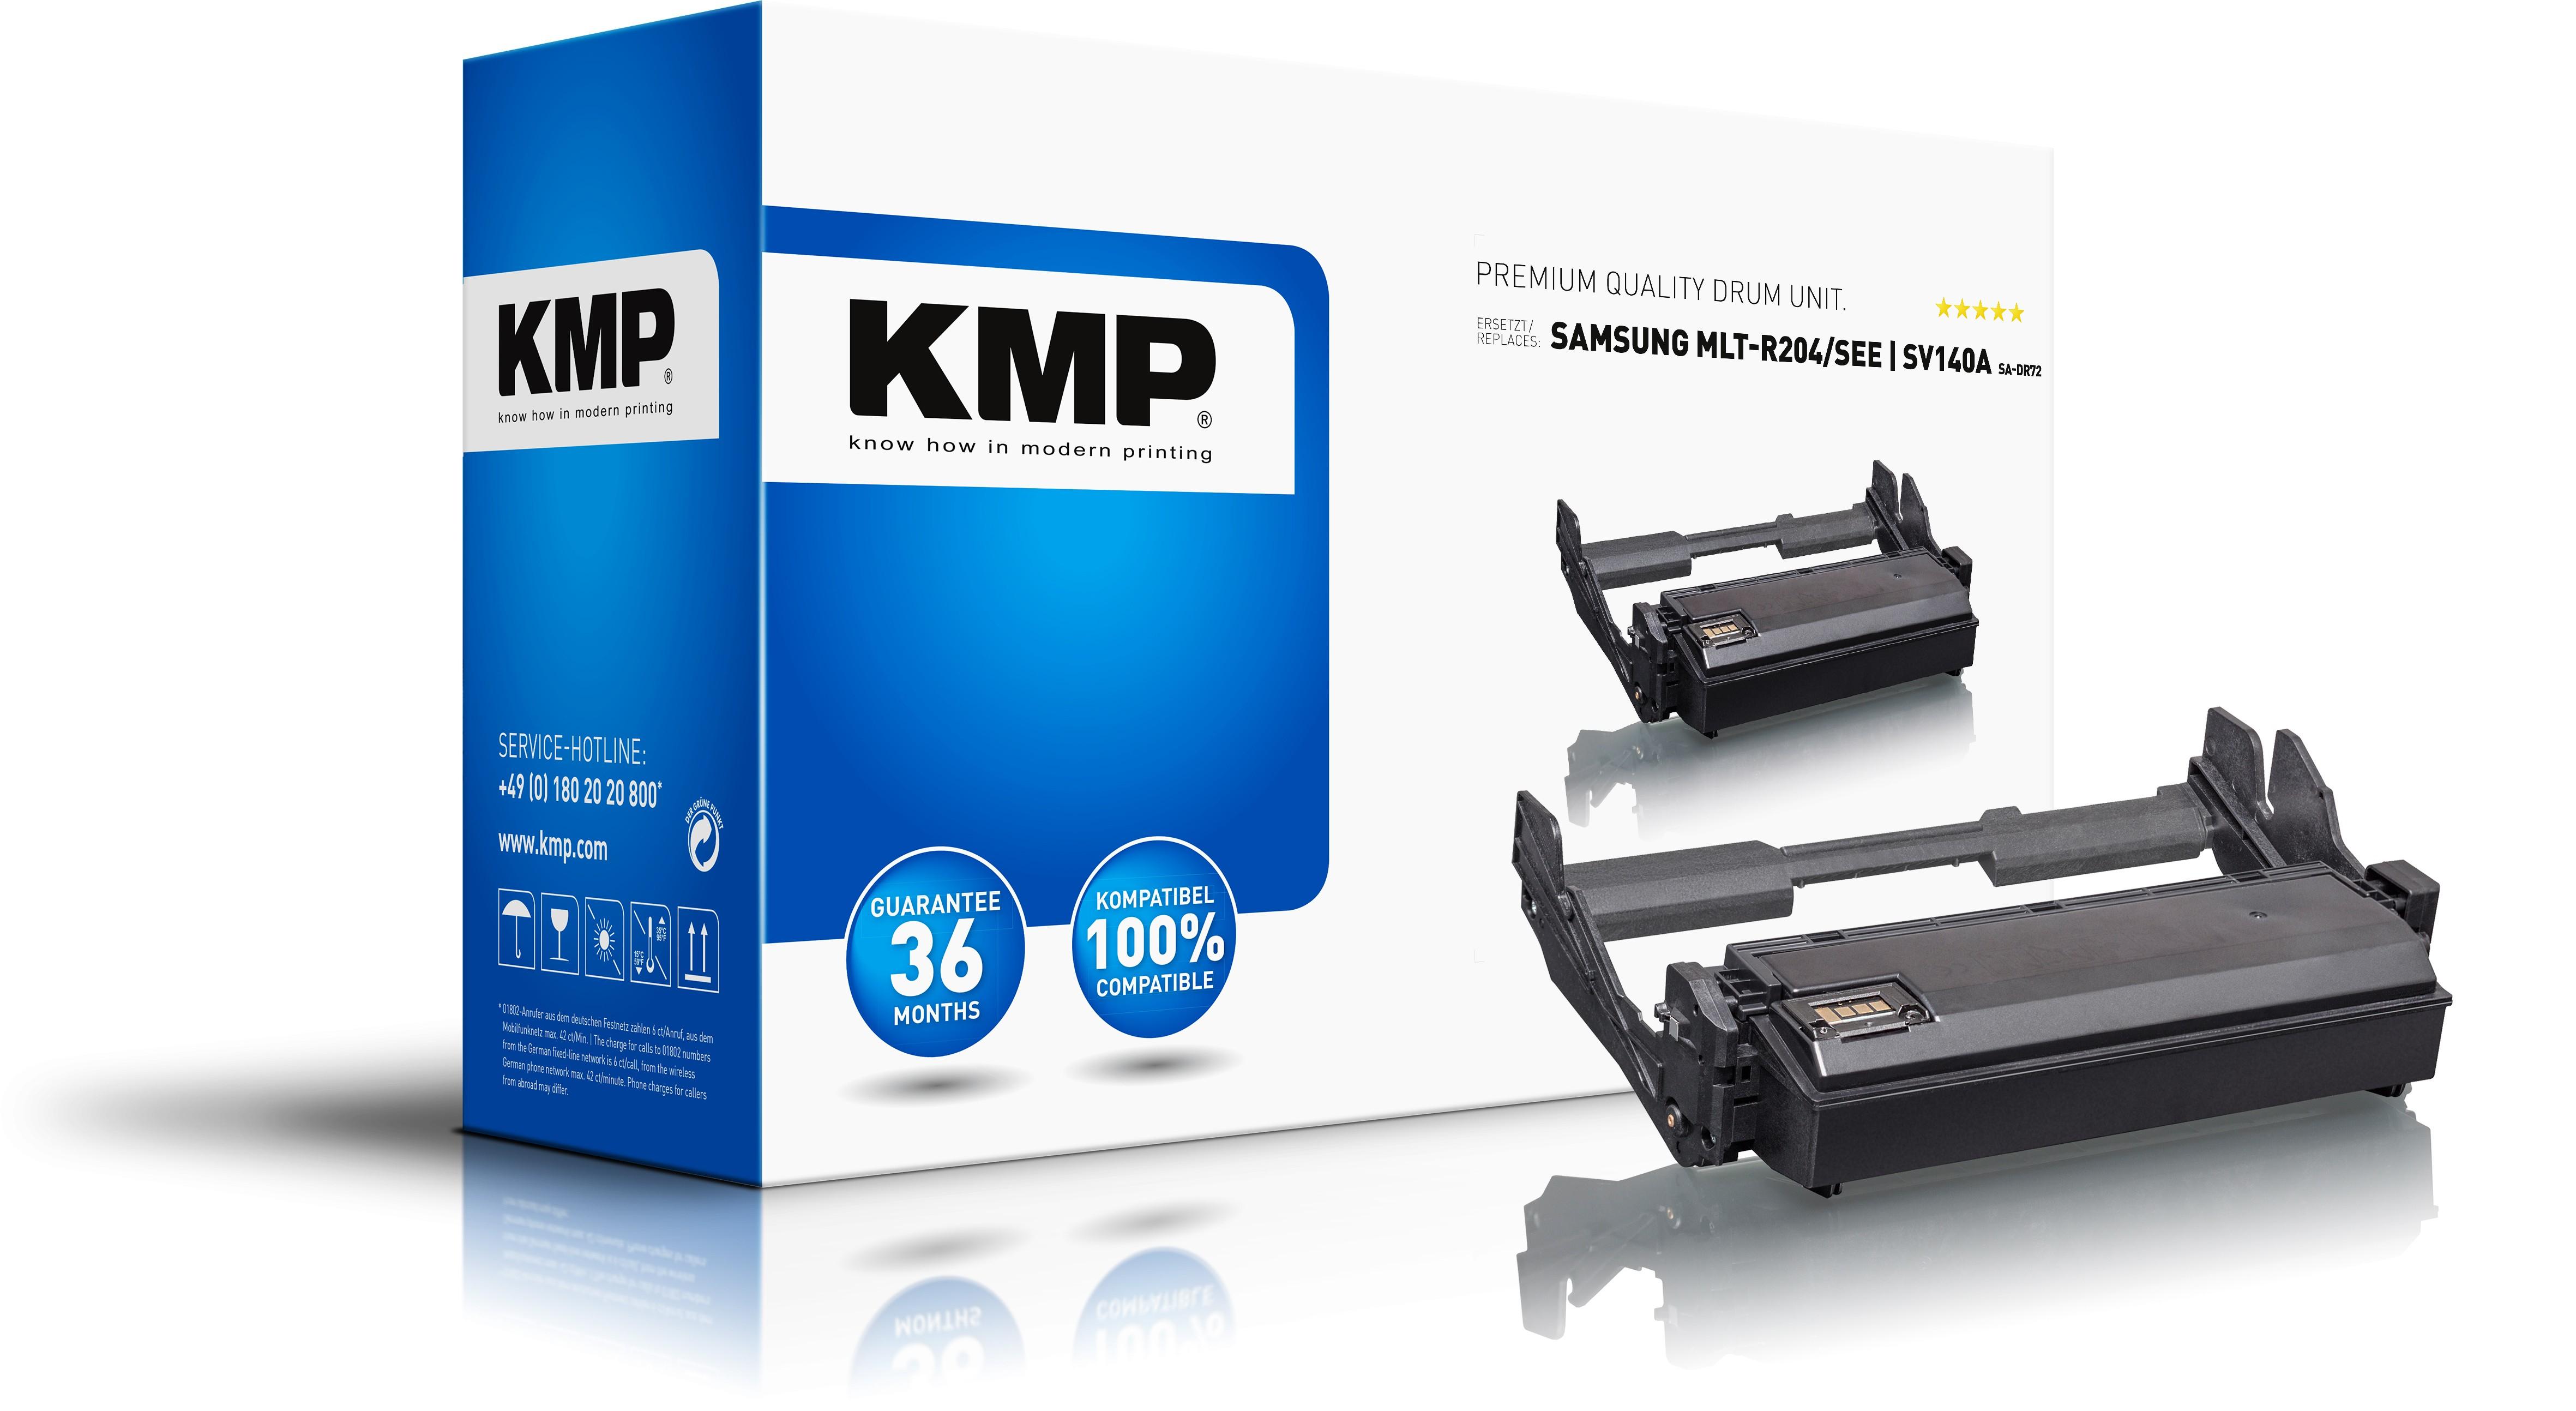 KMP 3516,7000 - Compatible - Samsung - Samsung R204 (MLTR204SEE) - 1 Stück(e)